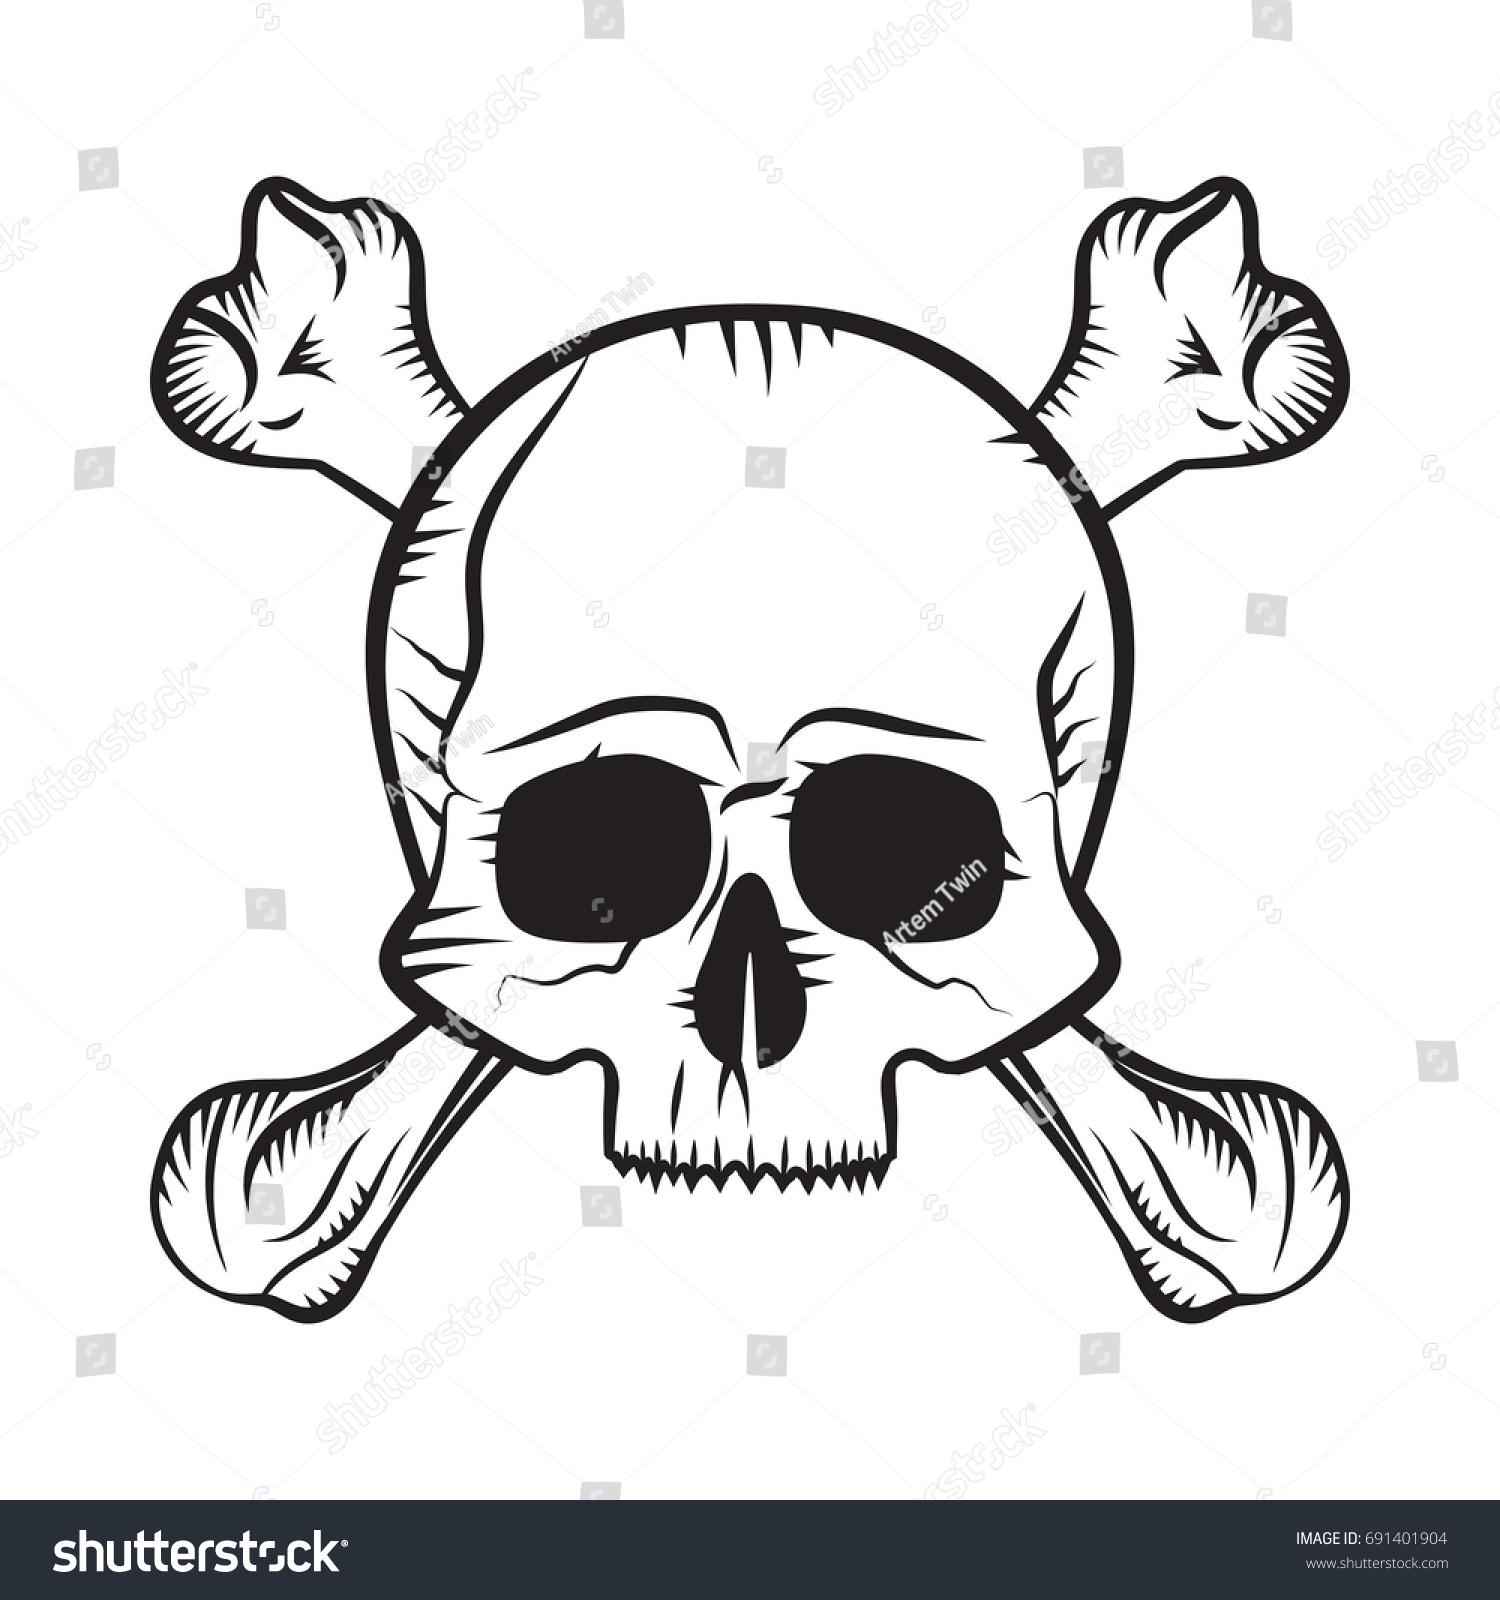 Pirate Glossary of Nautical Terms  Talk like a pirate